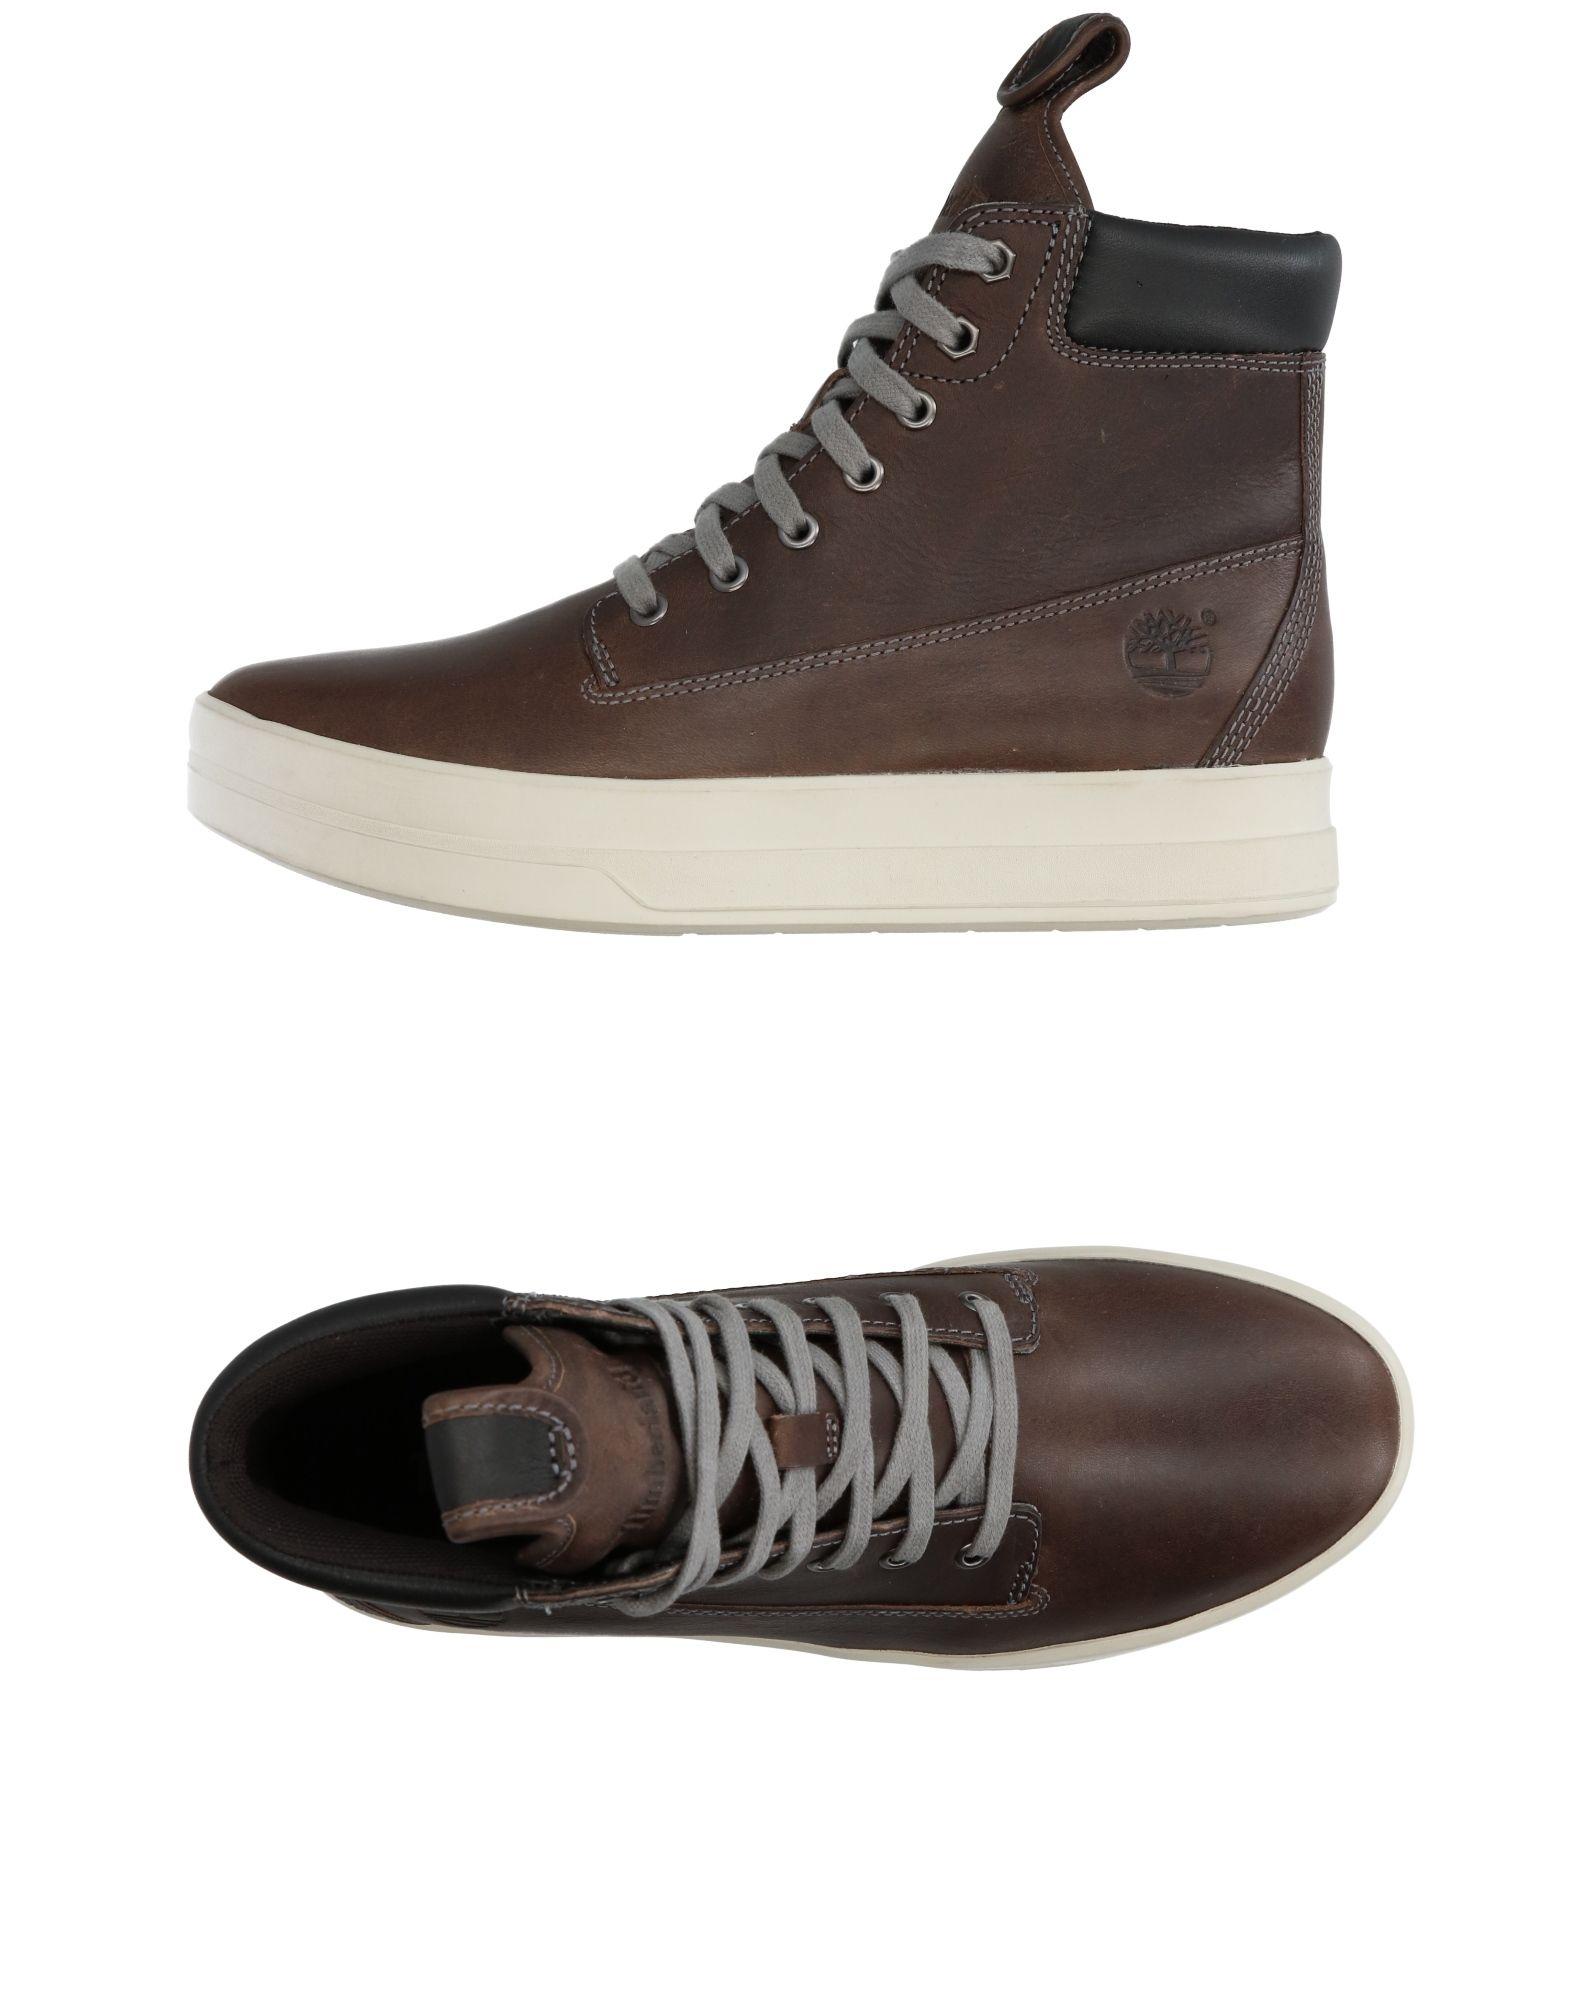 TIMBERLAND Высокие кеды и кроссовки кеды кроссовки высокие dc council mid tx stone camo